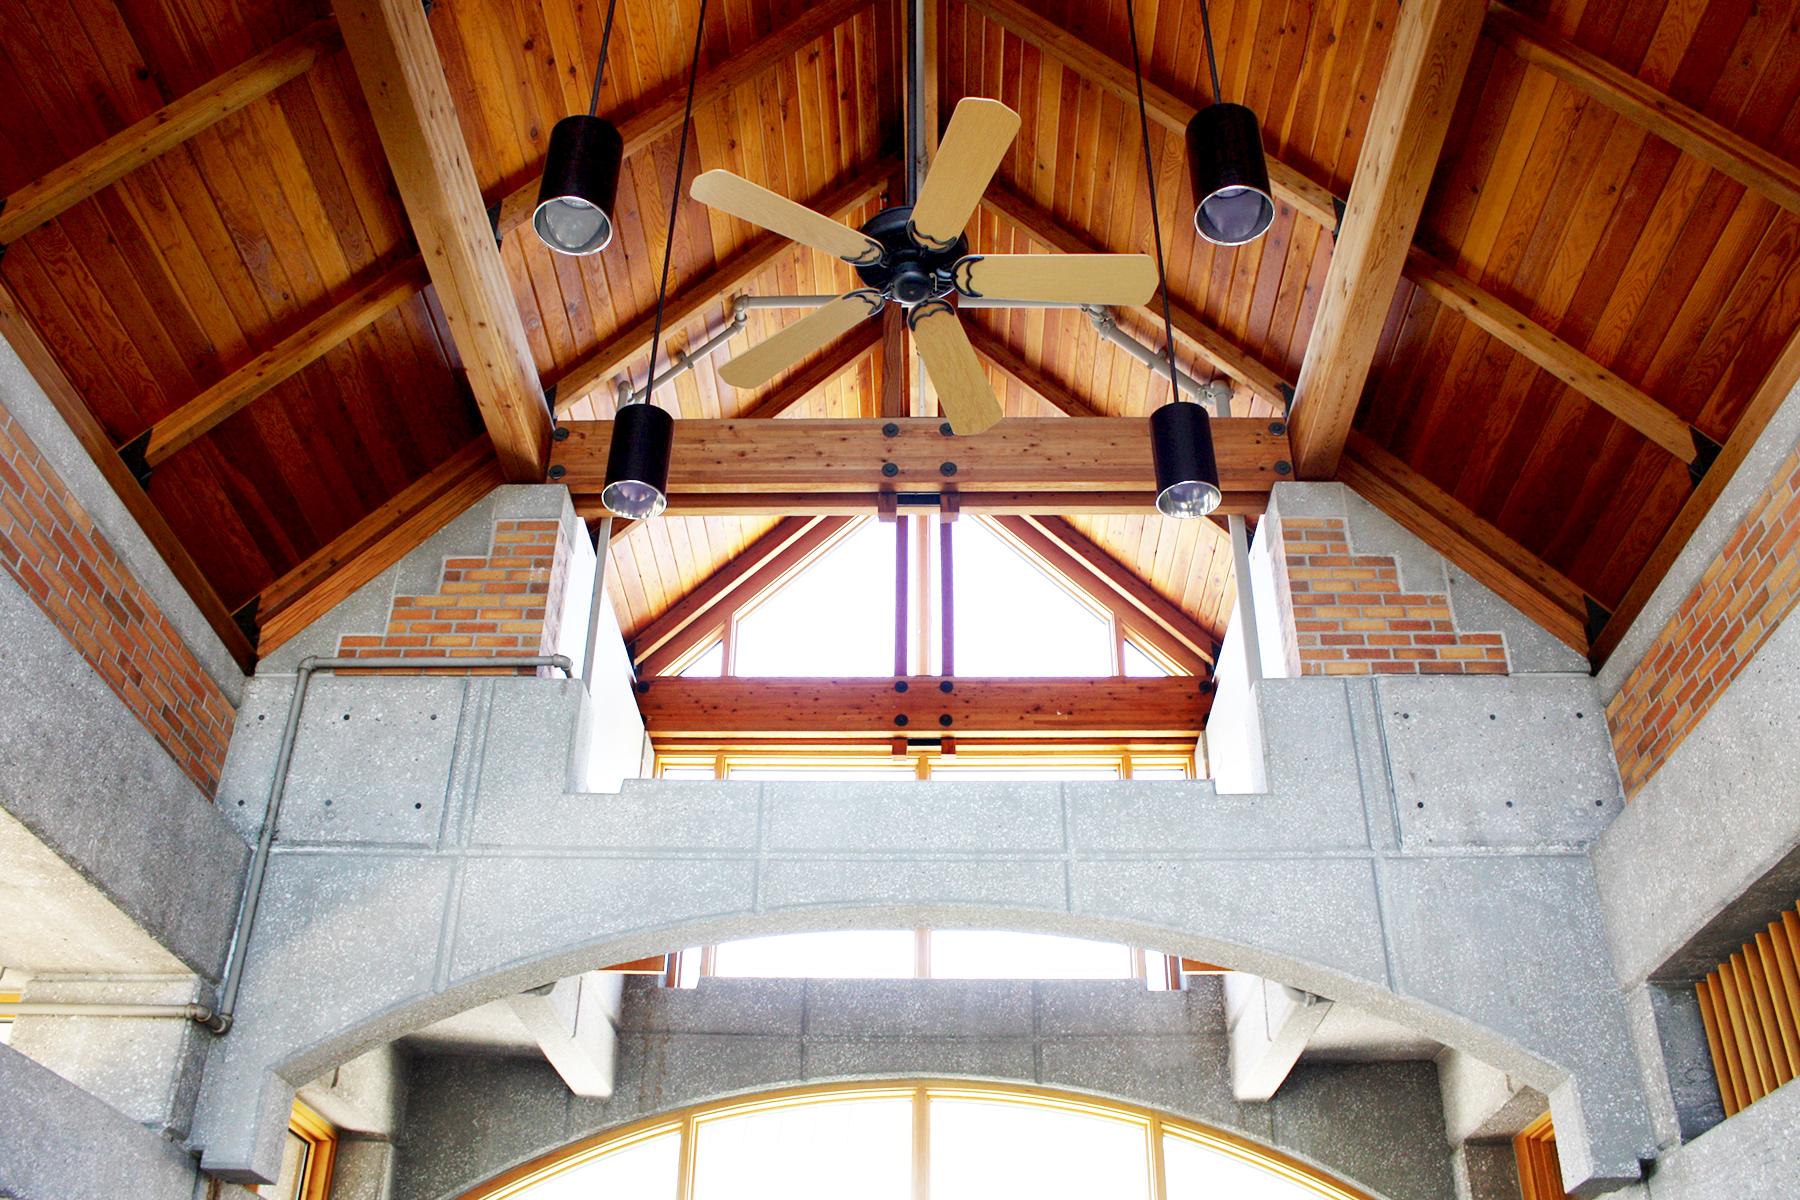 jkdc_sih-ceiling.jpg